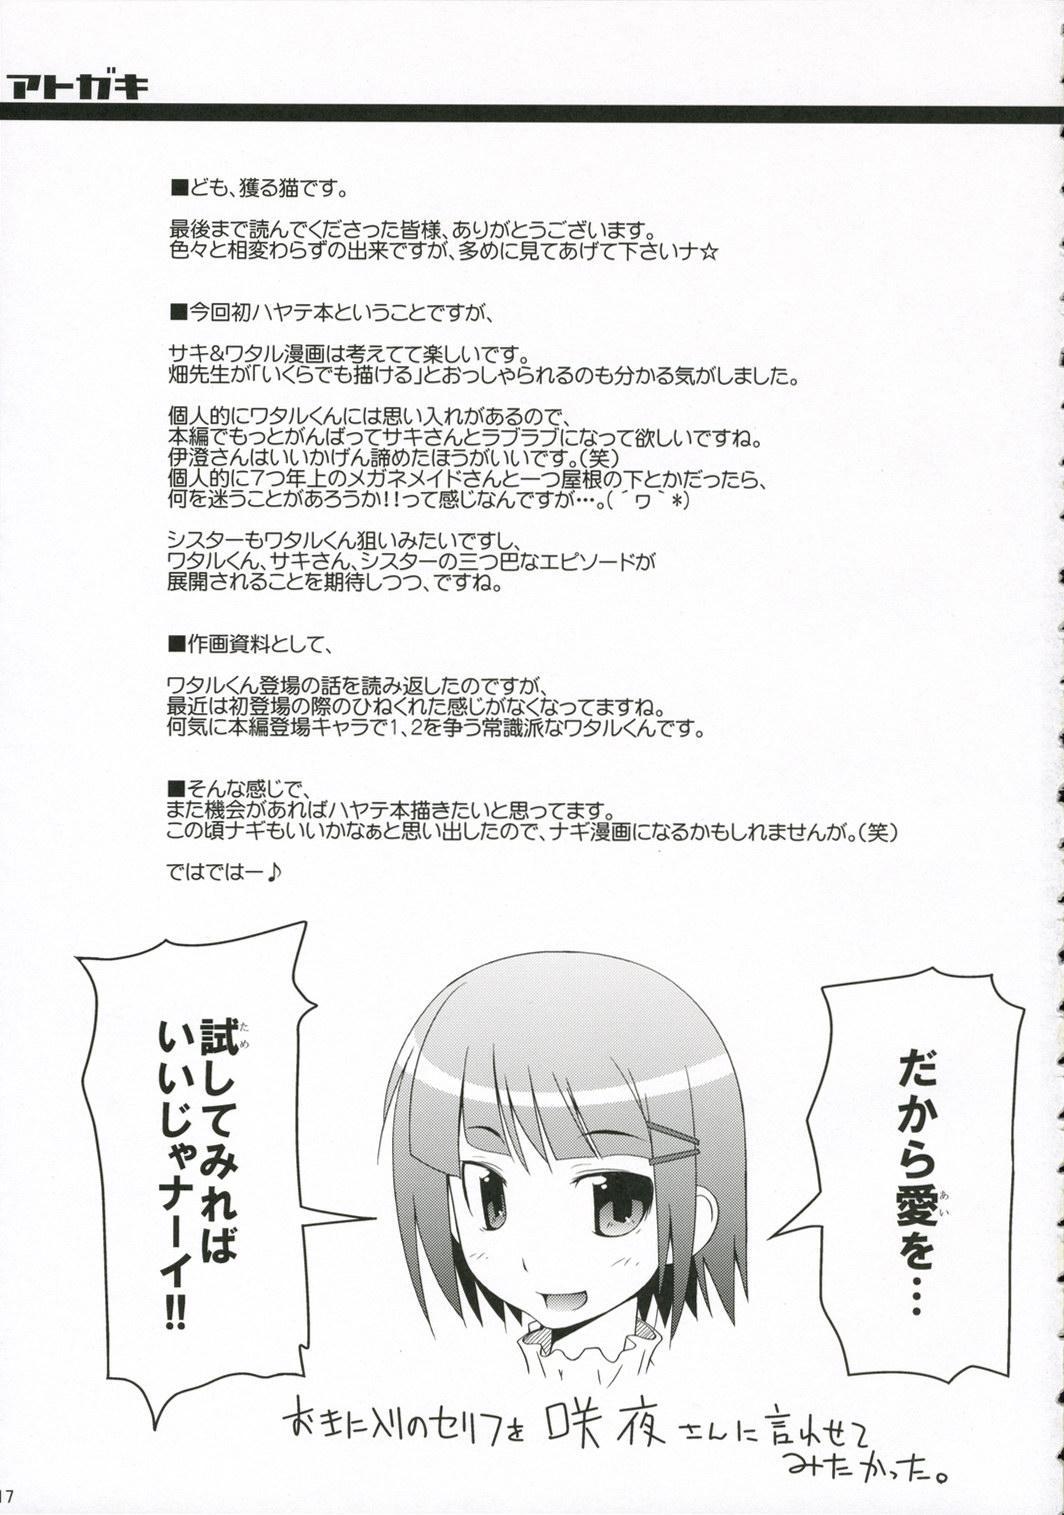 Sakittyo Shoukougun 15